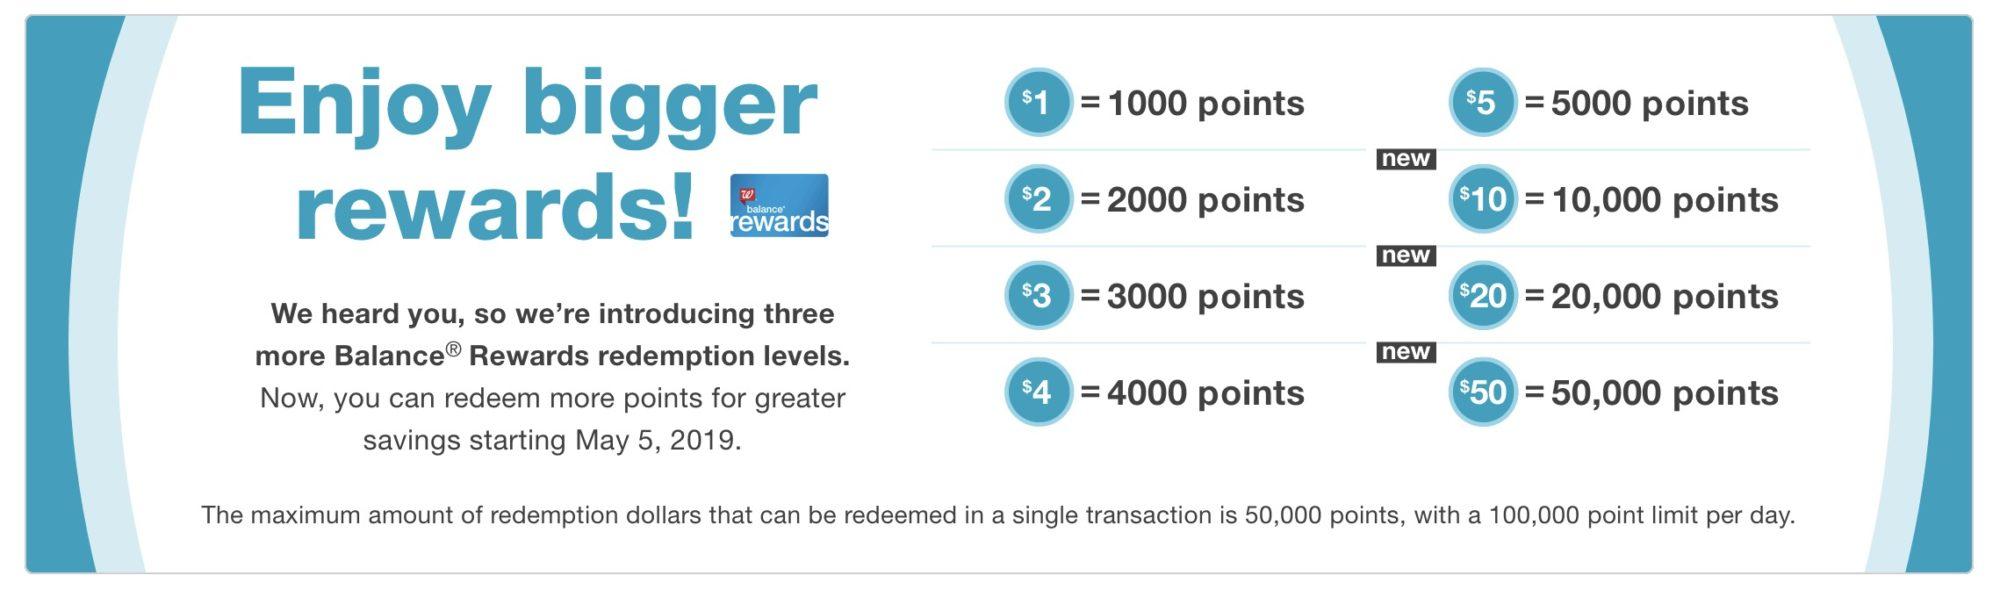 2019 Walgreens Balance Rewards changes